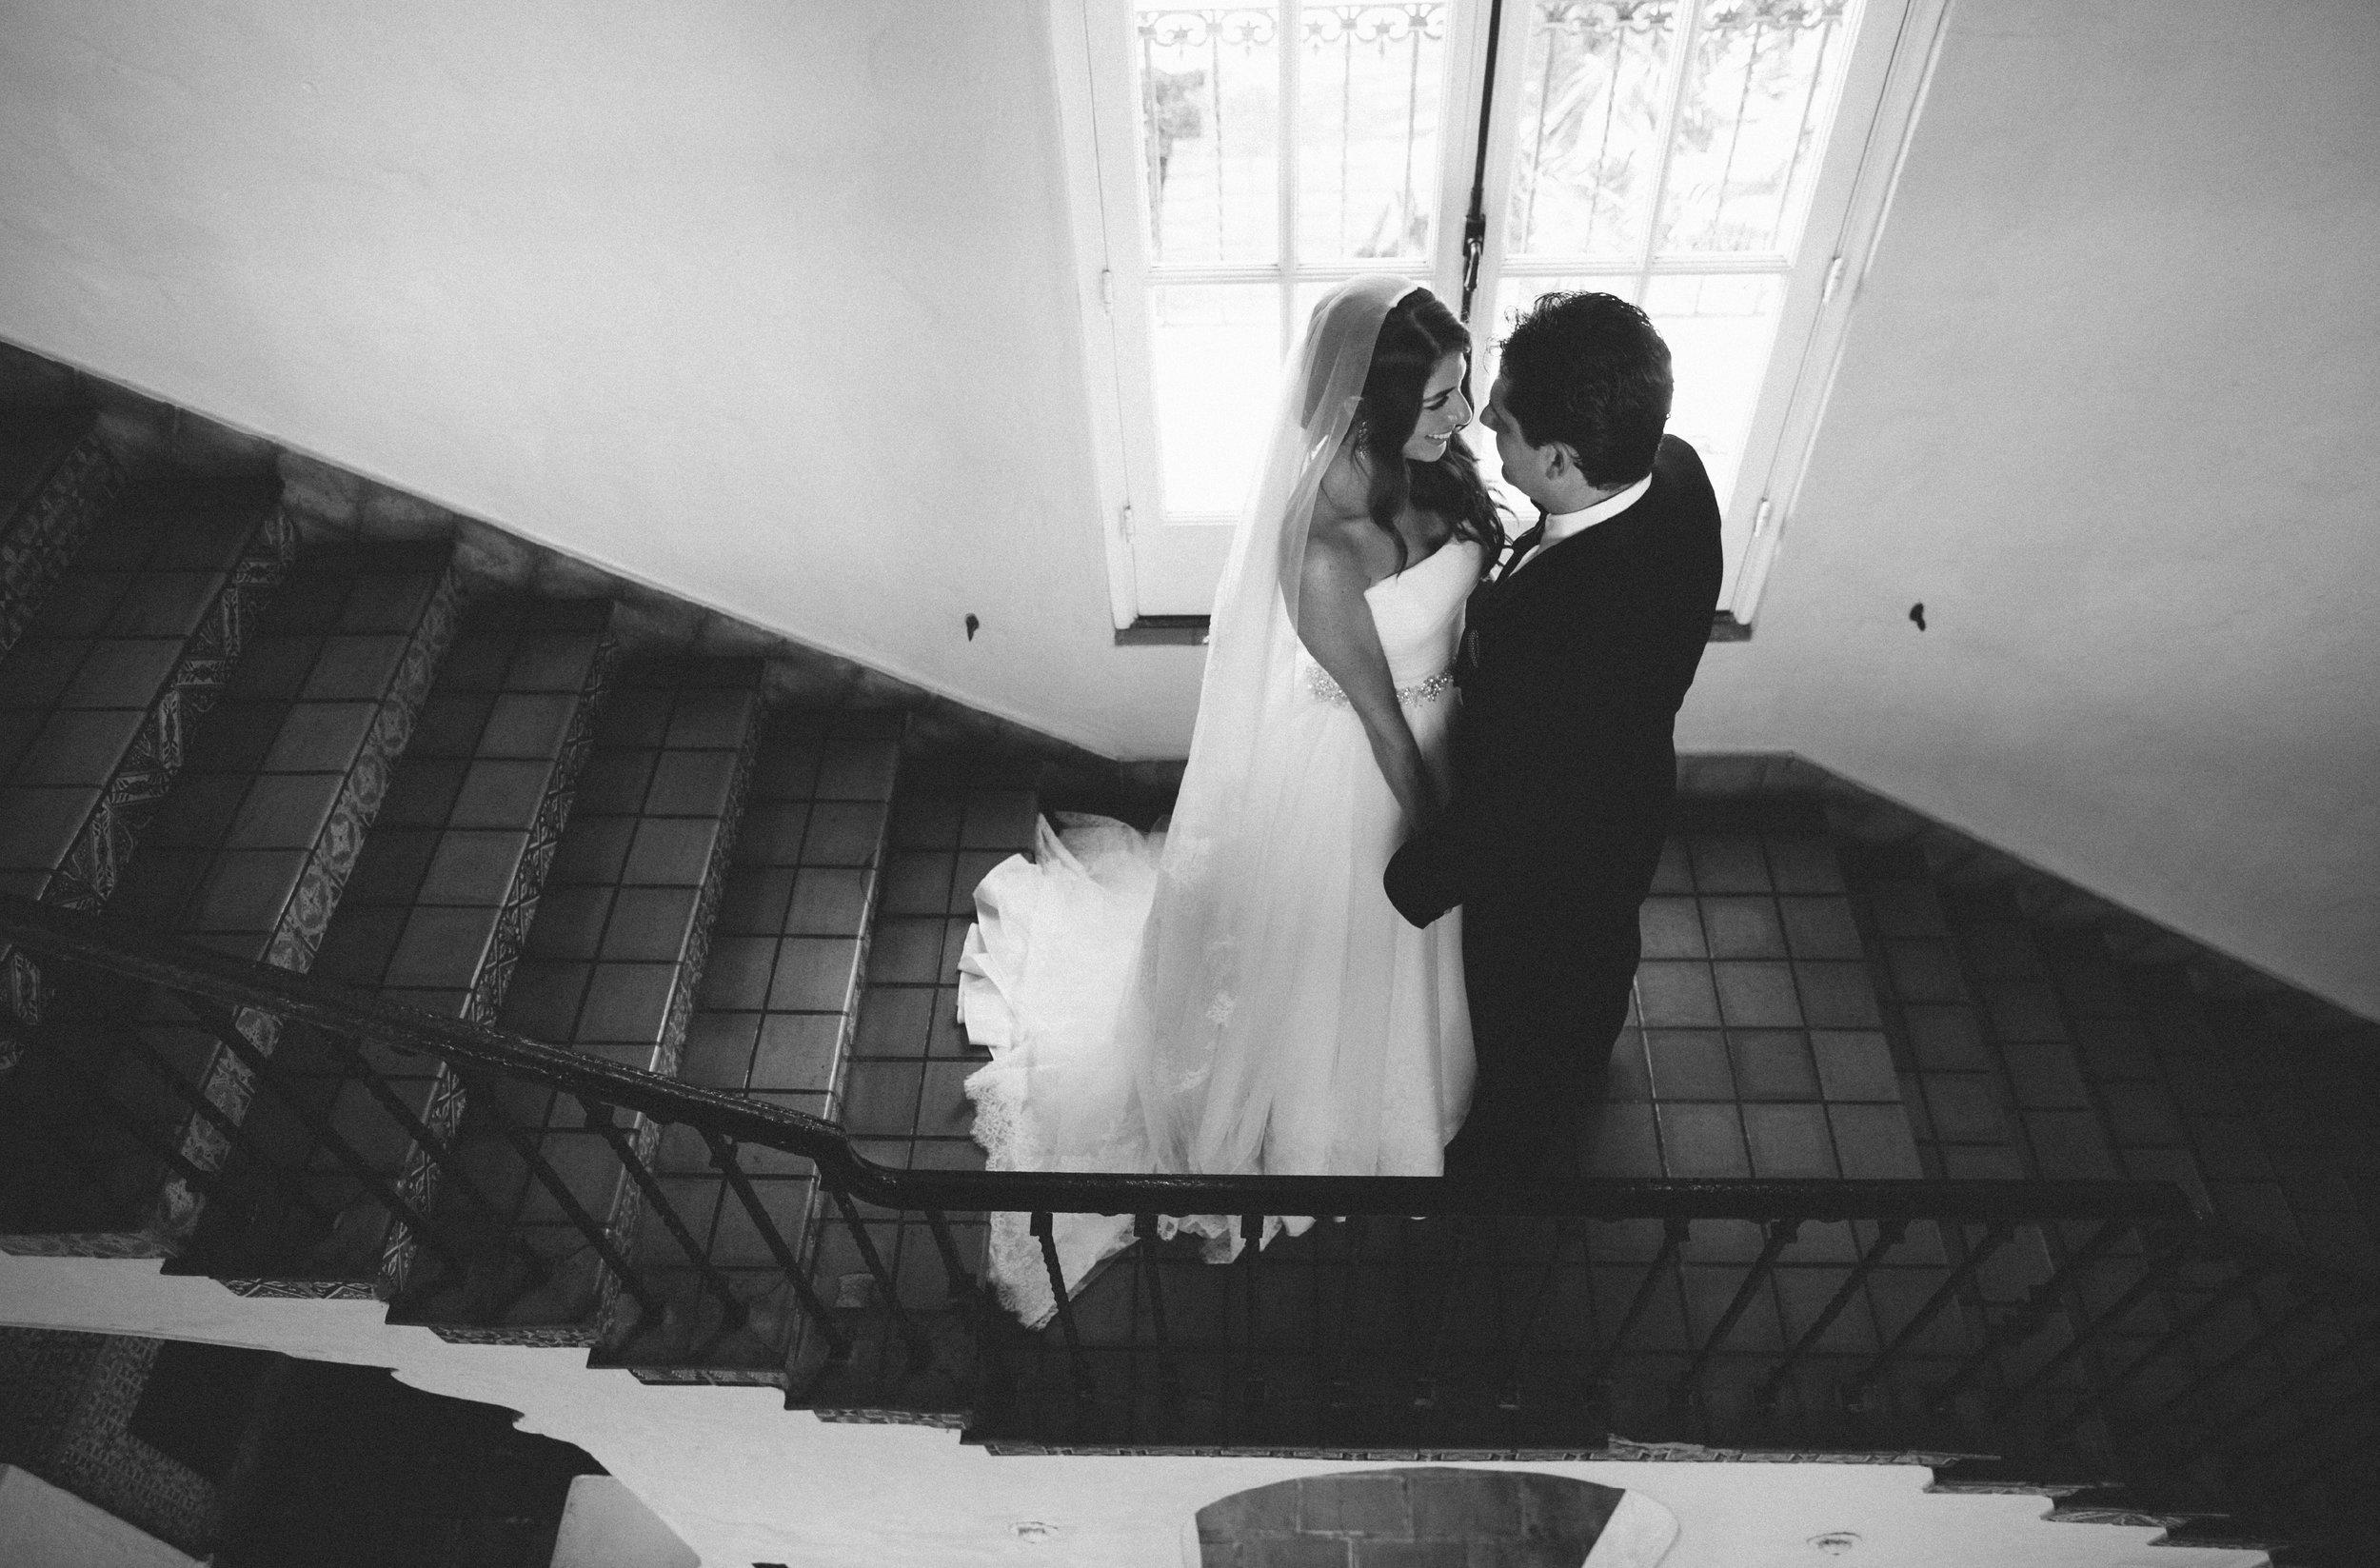 Meli + Mike Coconut Grove Wedding at Villa Woodbine29.jpg